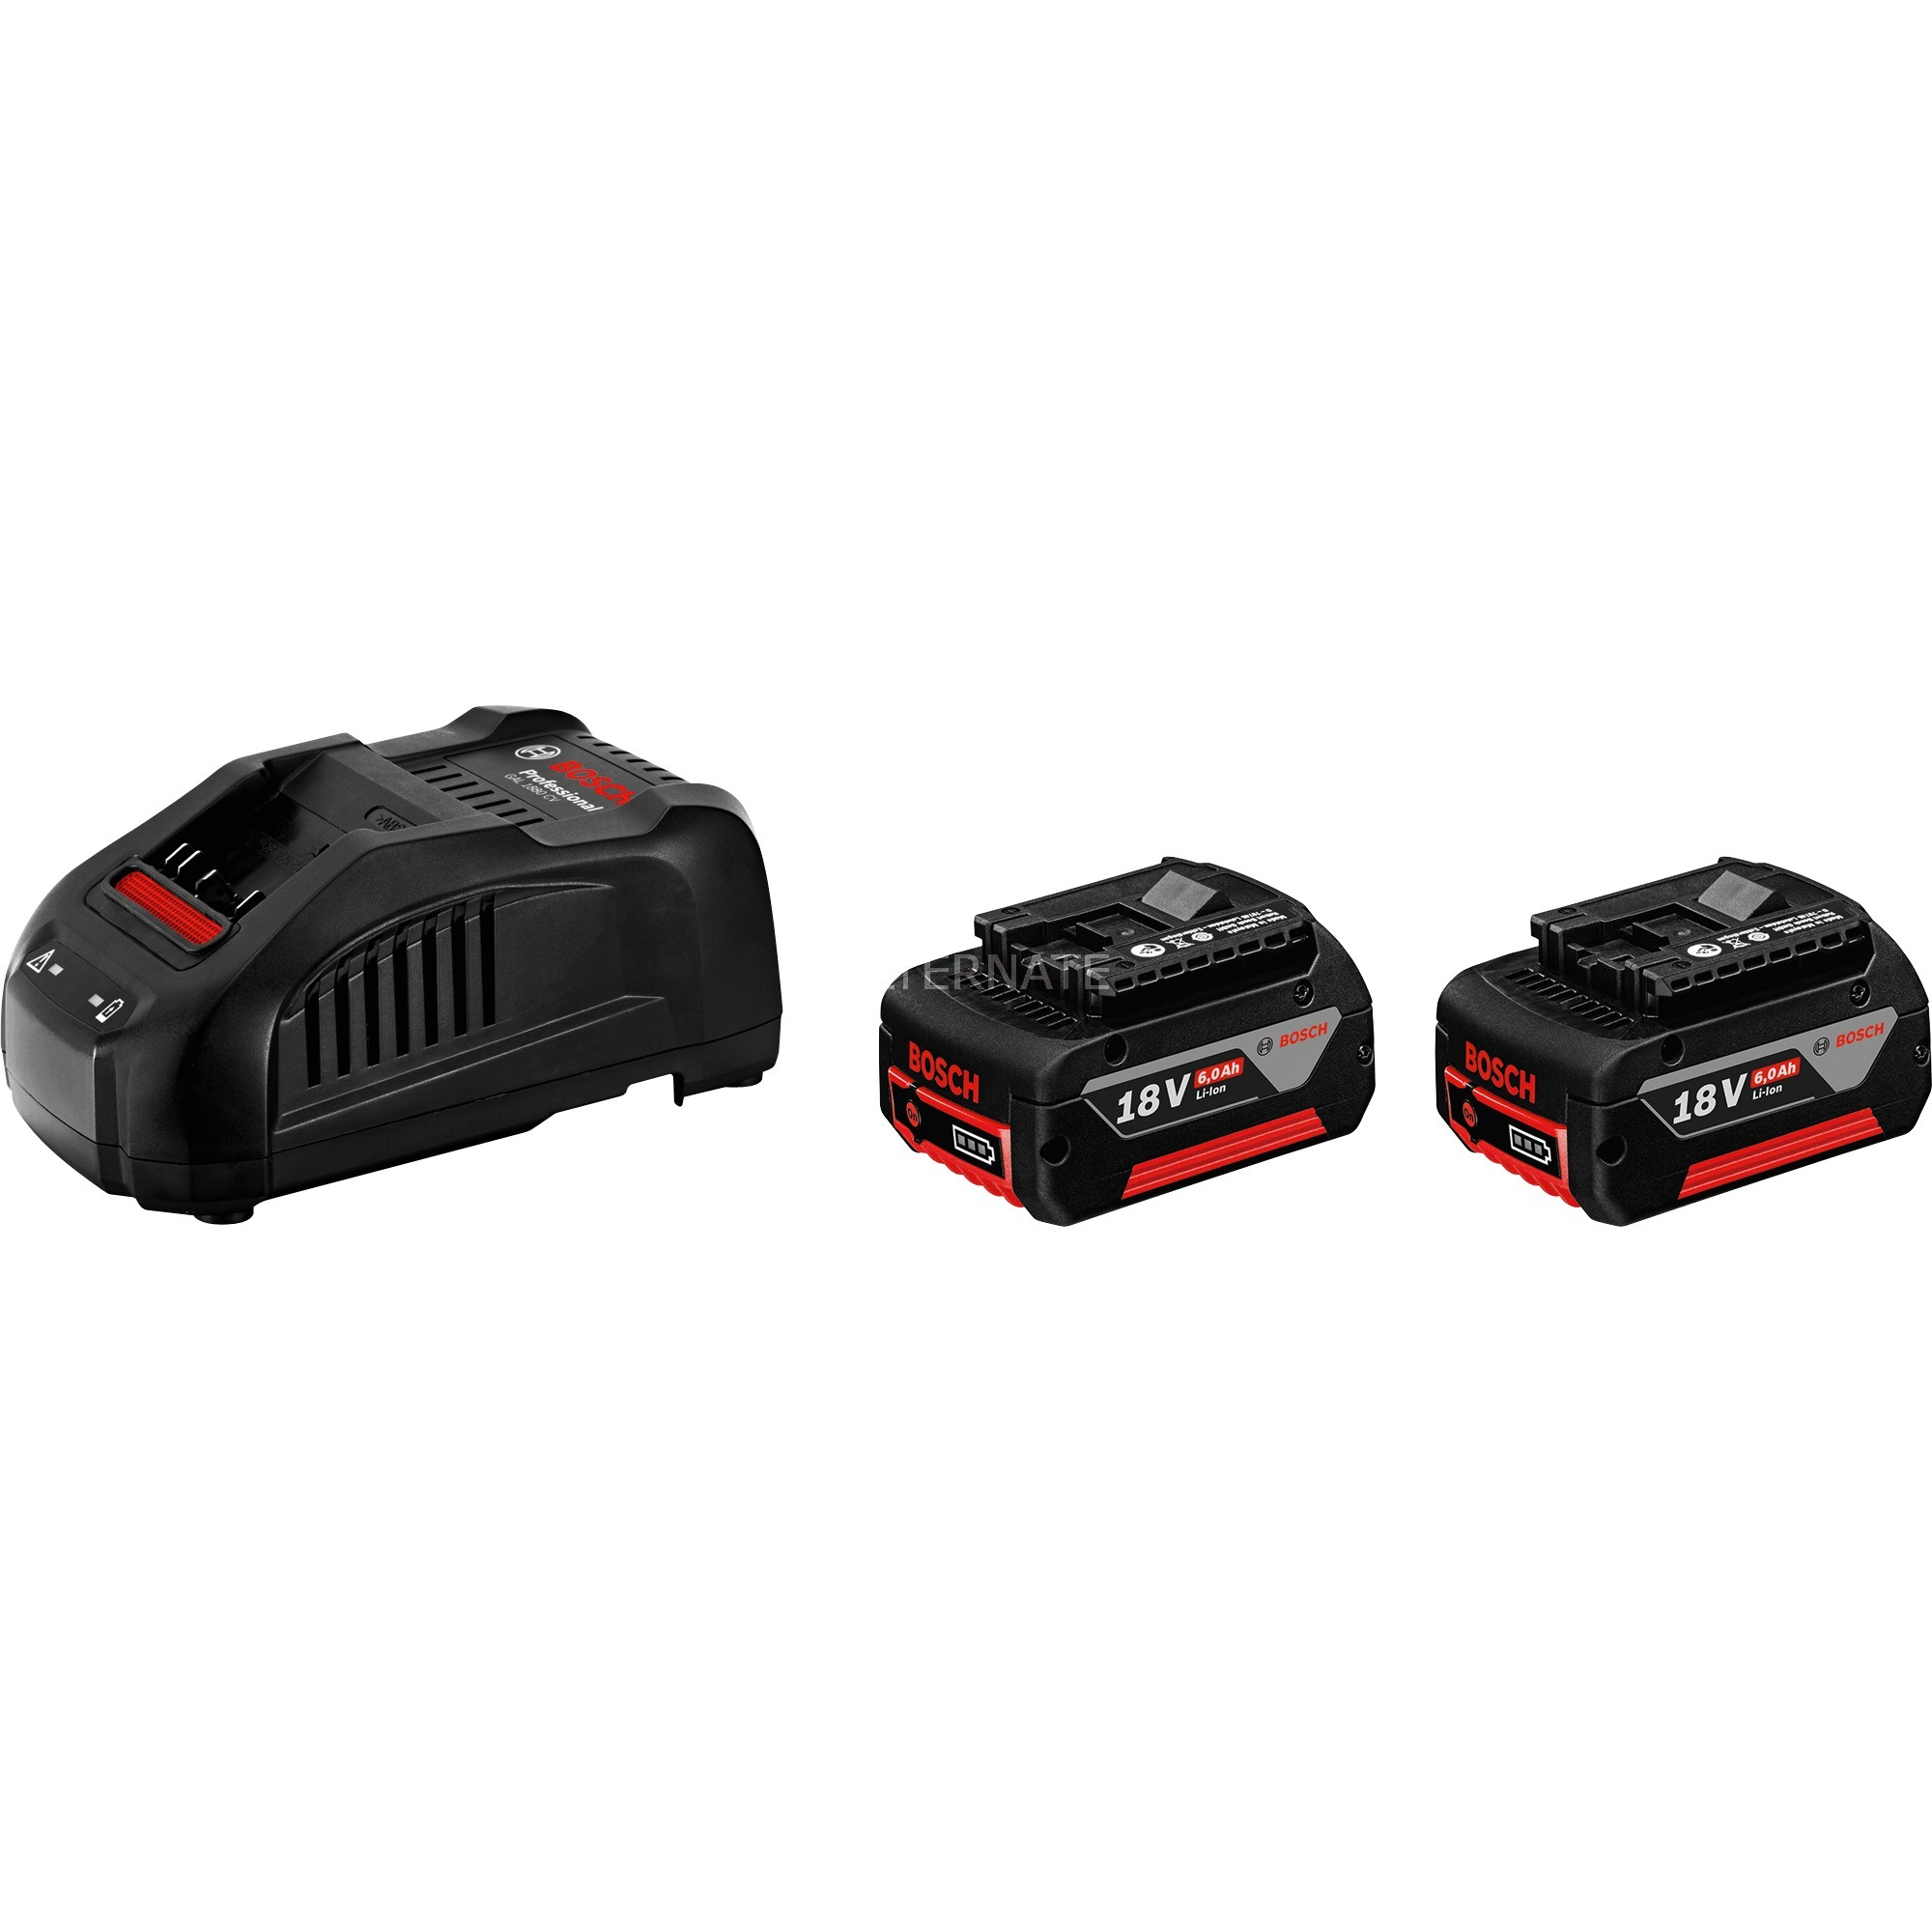 1 600 A00 B8L cargador y batería cargable Cargador de batería, Conjunto